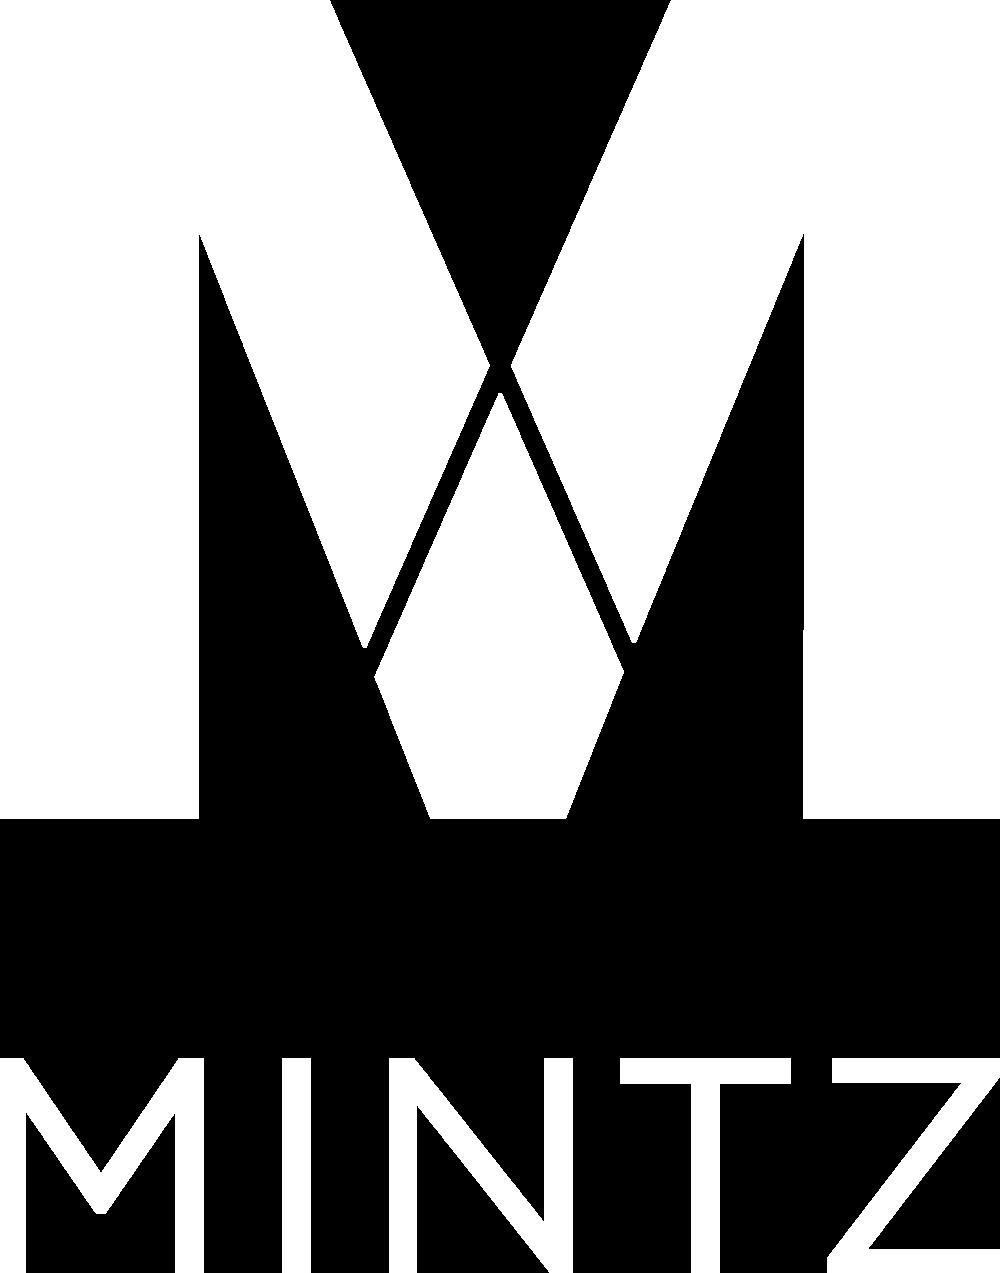 mintz_vert_white.png